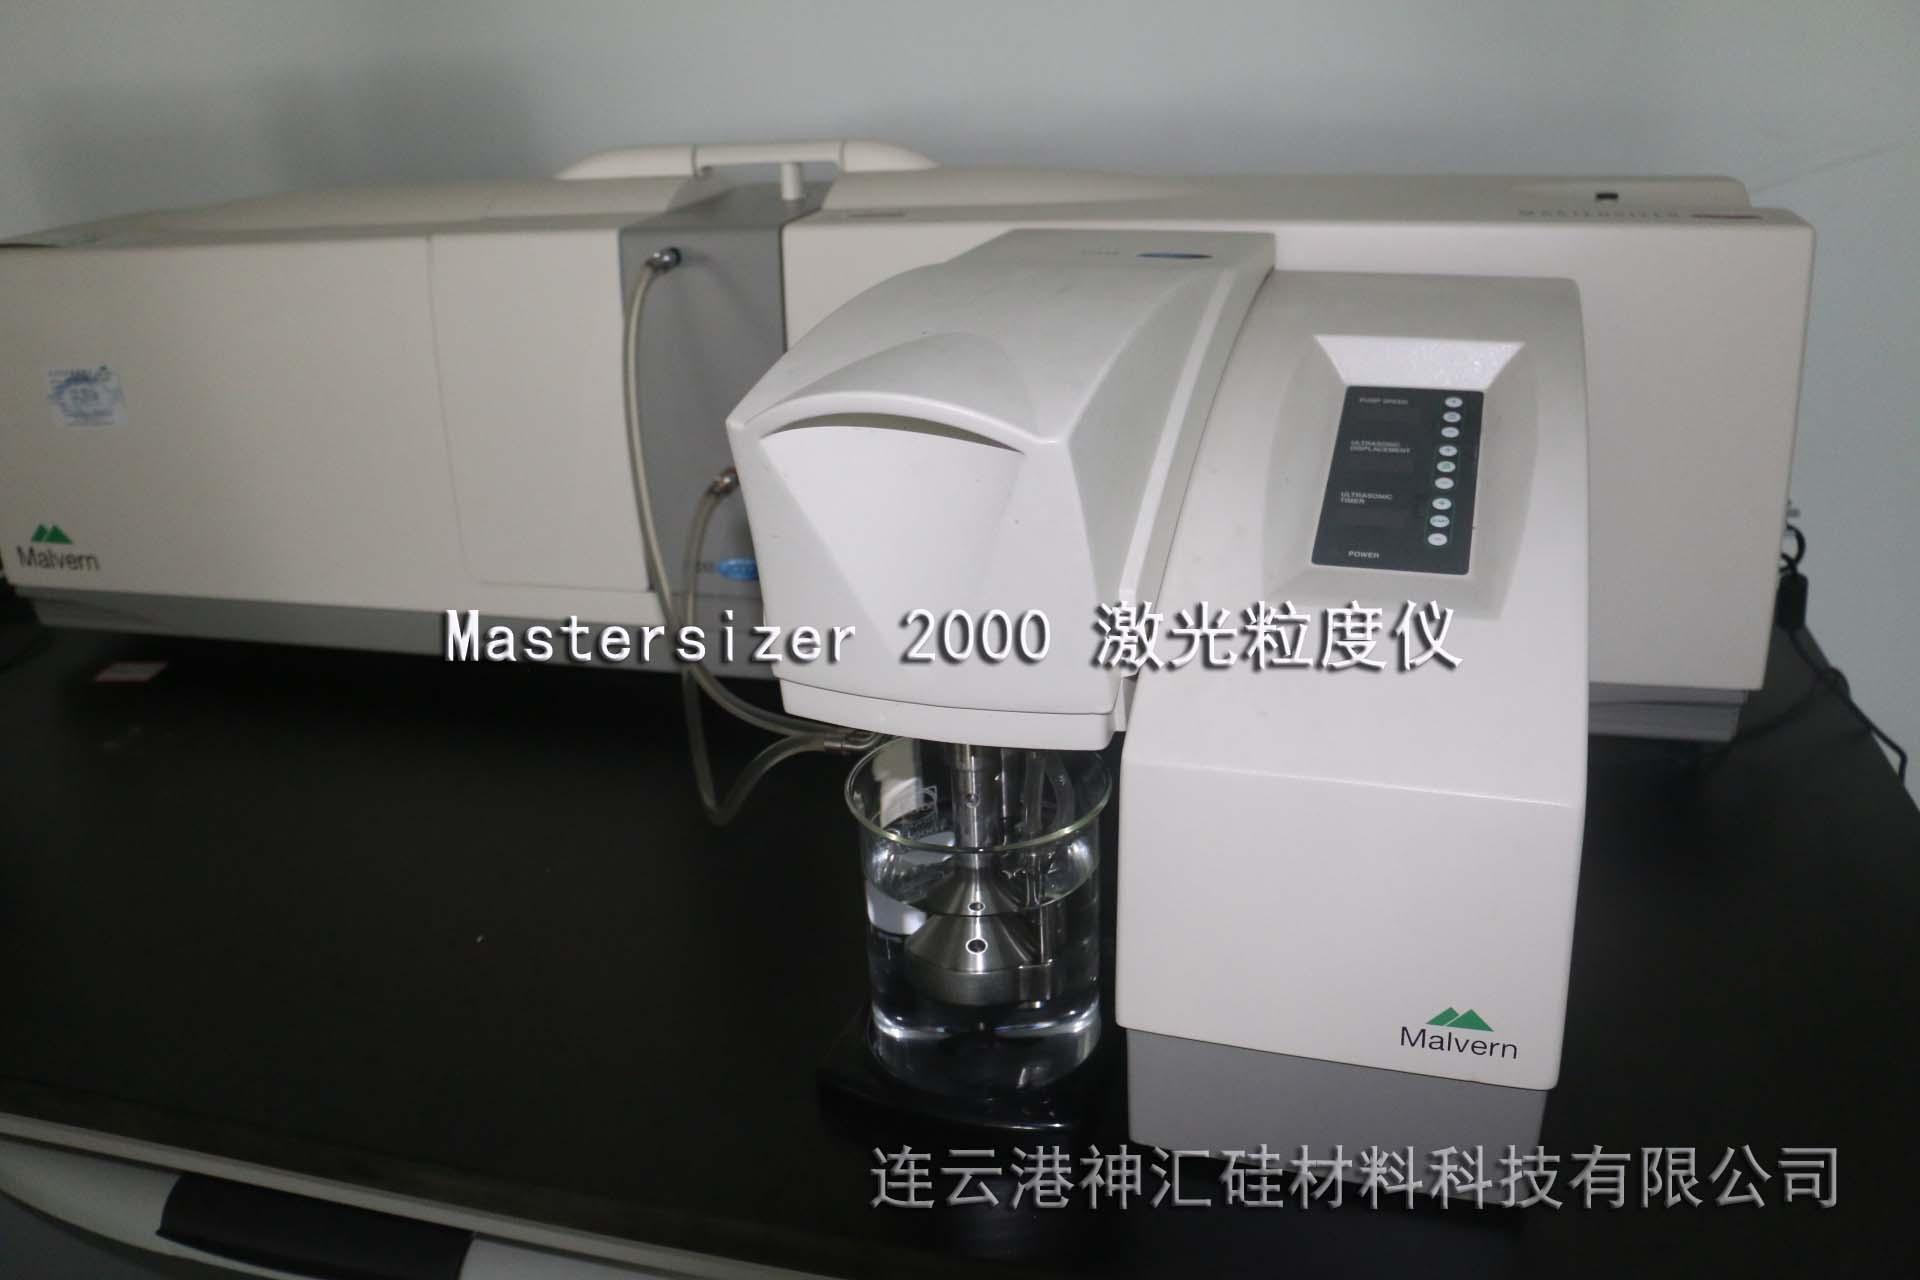 Mstersizer 2000 laser particle size Analyzer